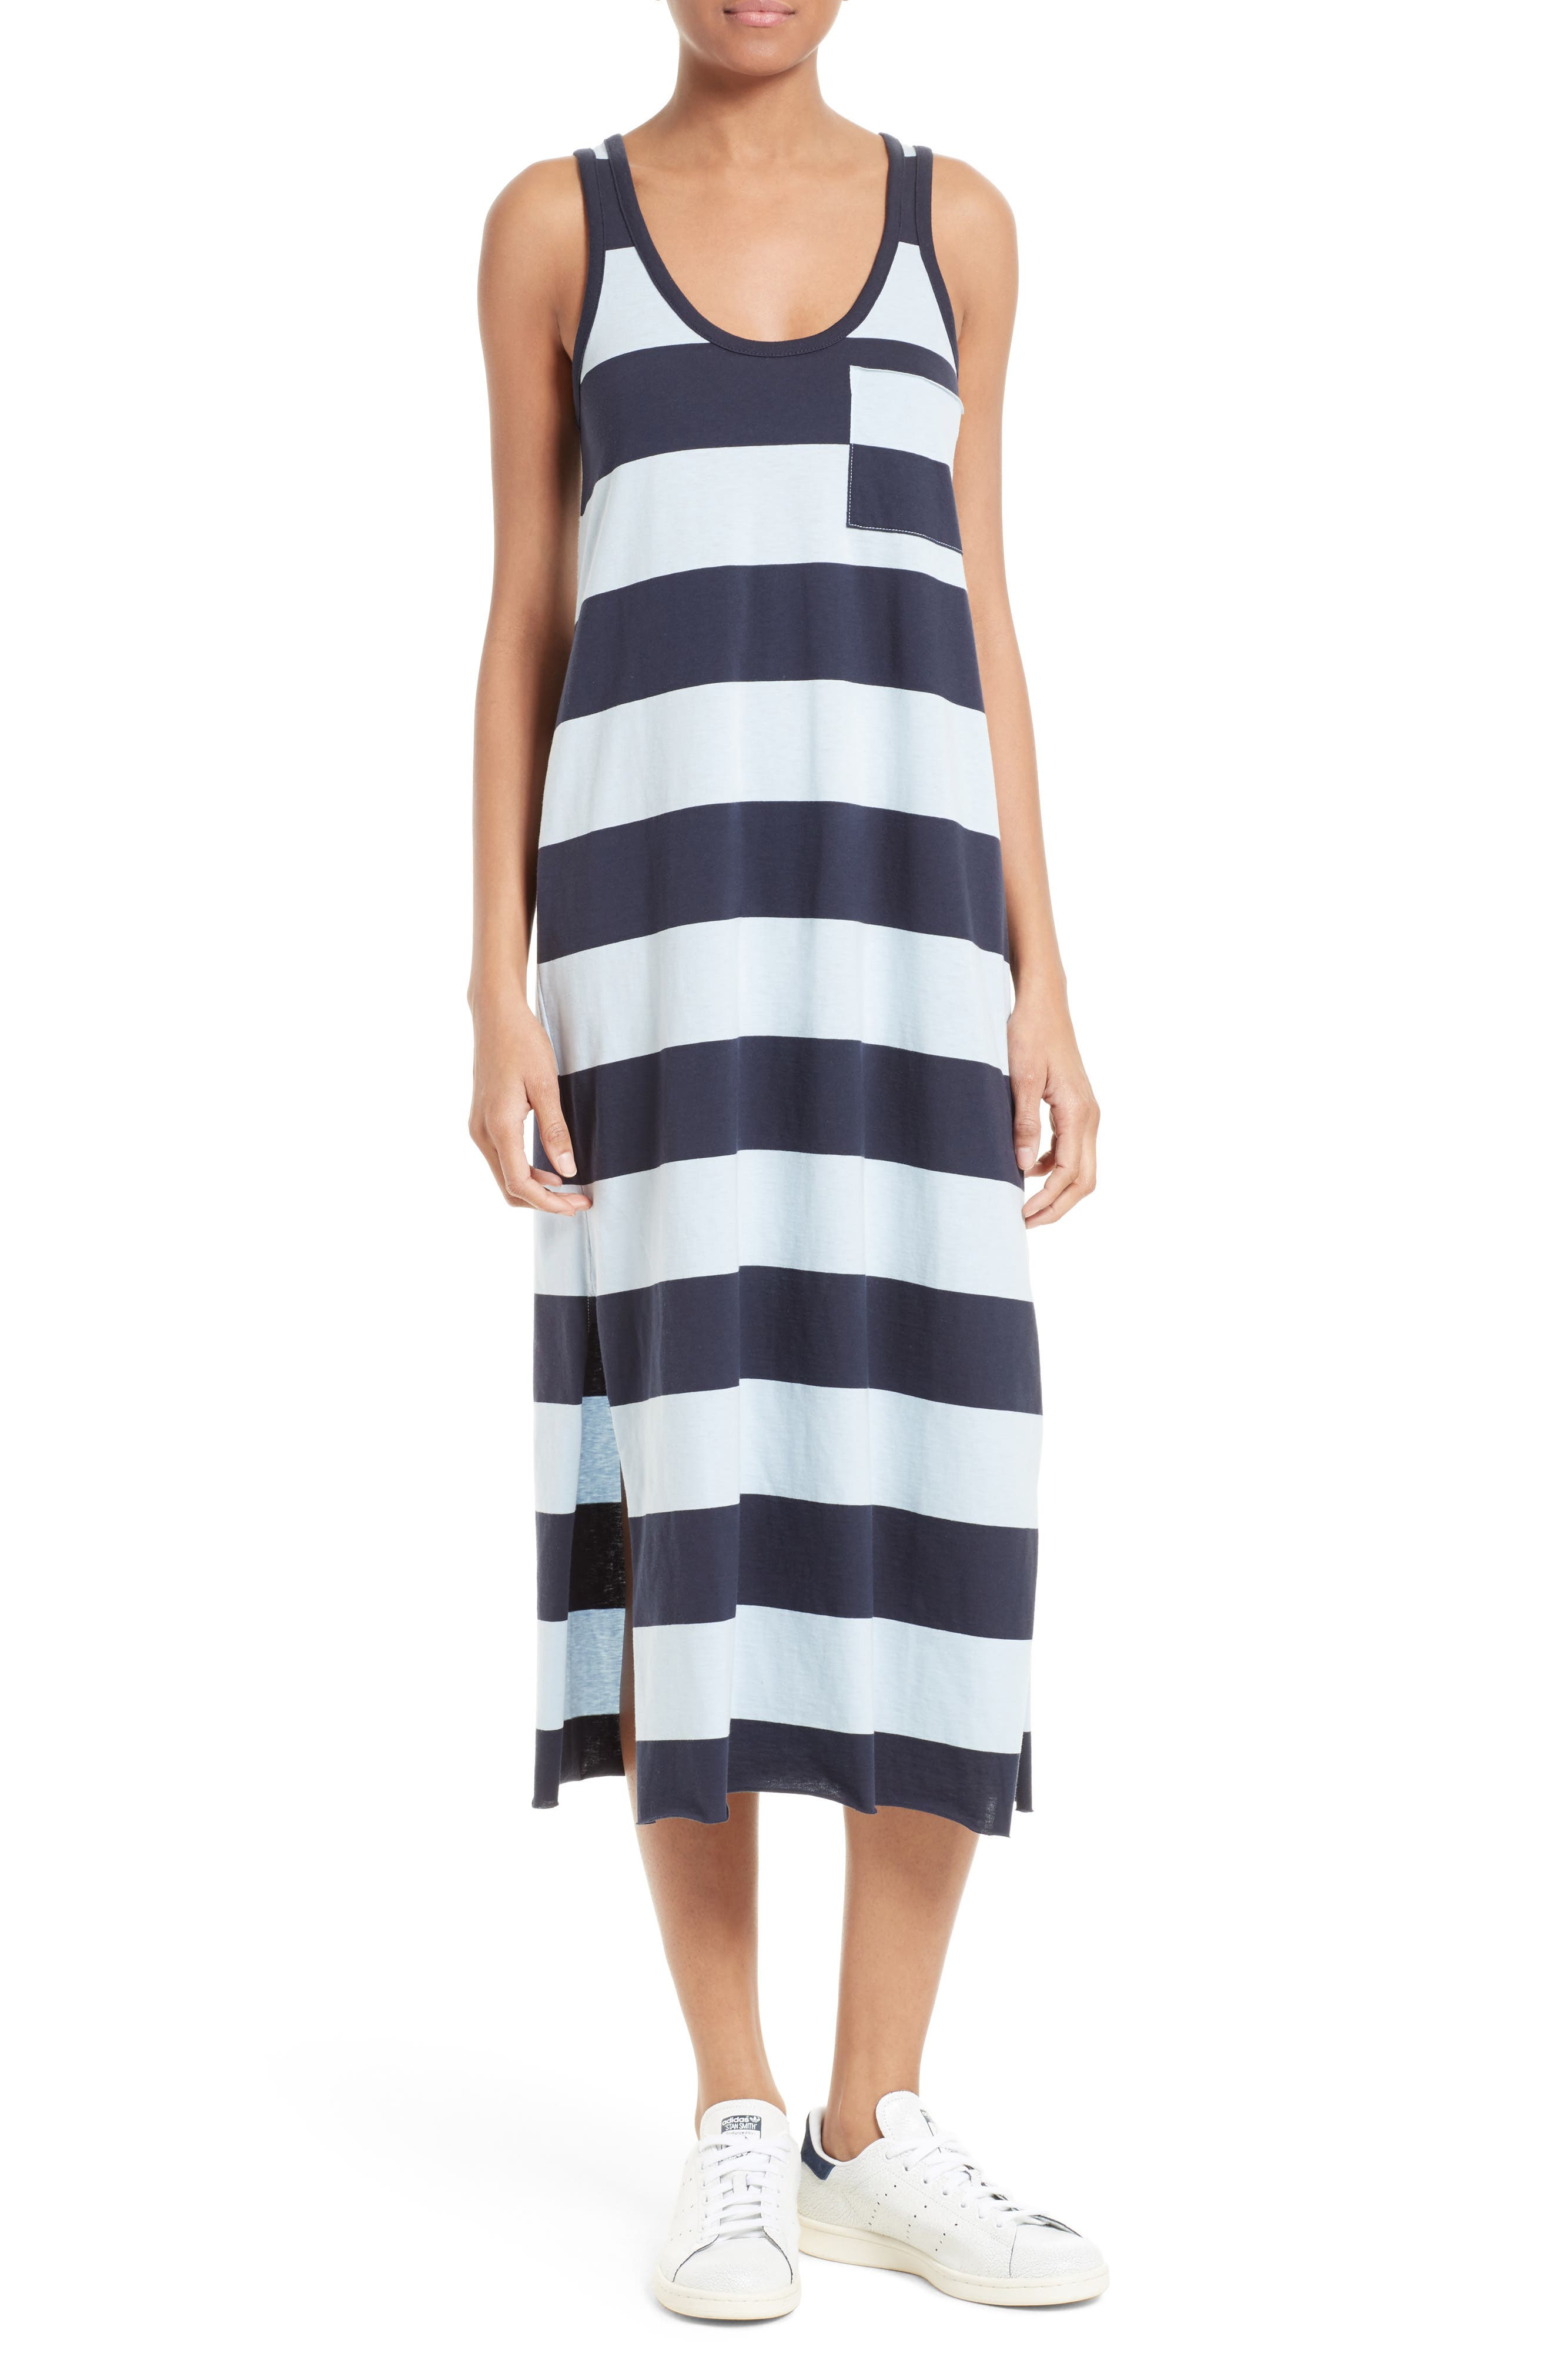 Alternate Image 1 Selected - ATM Anthony Thomas Melillo Stripe Mercerized Jersey Dress